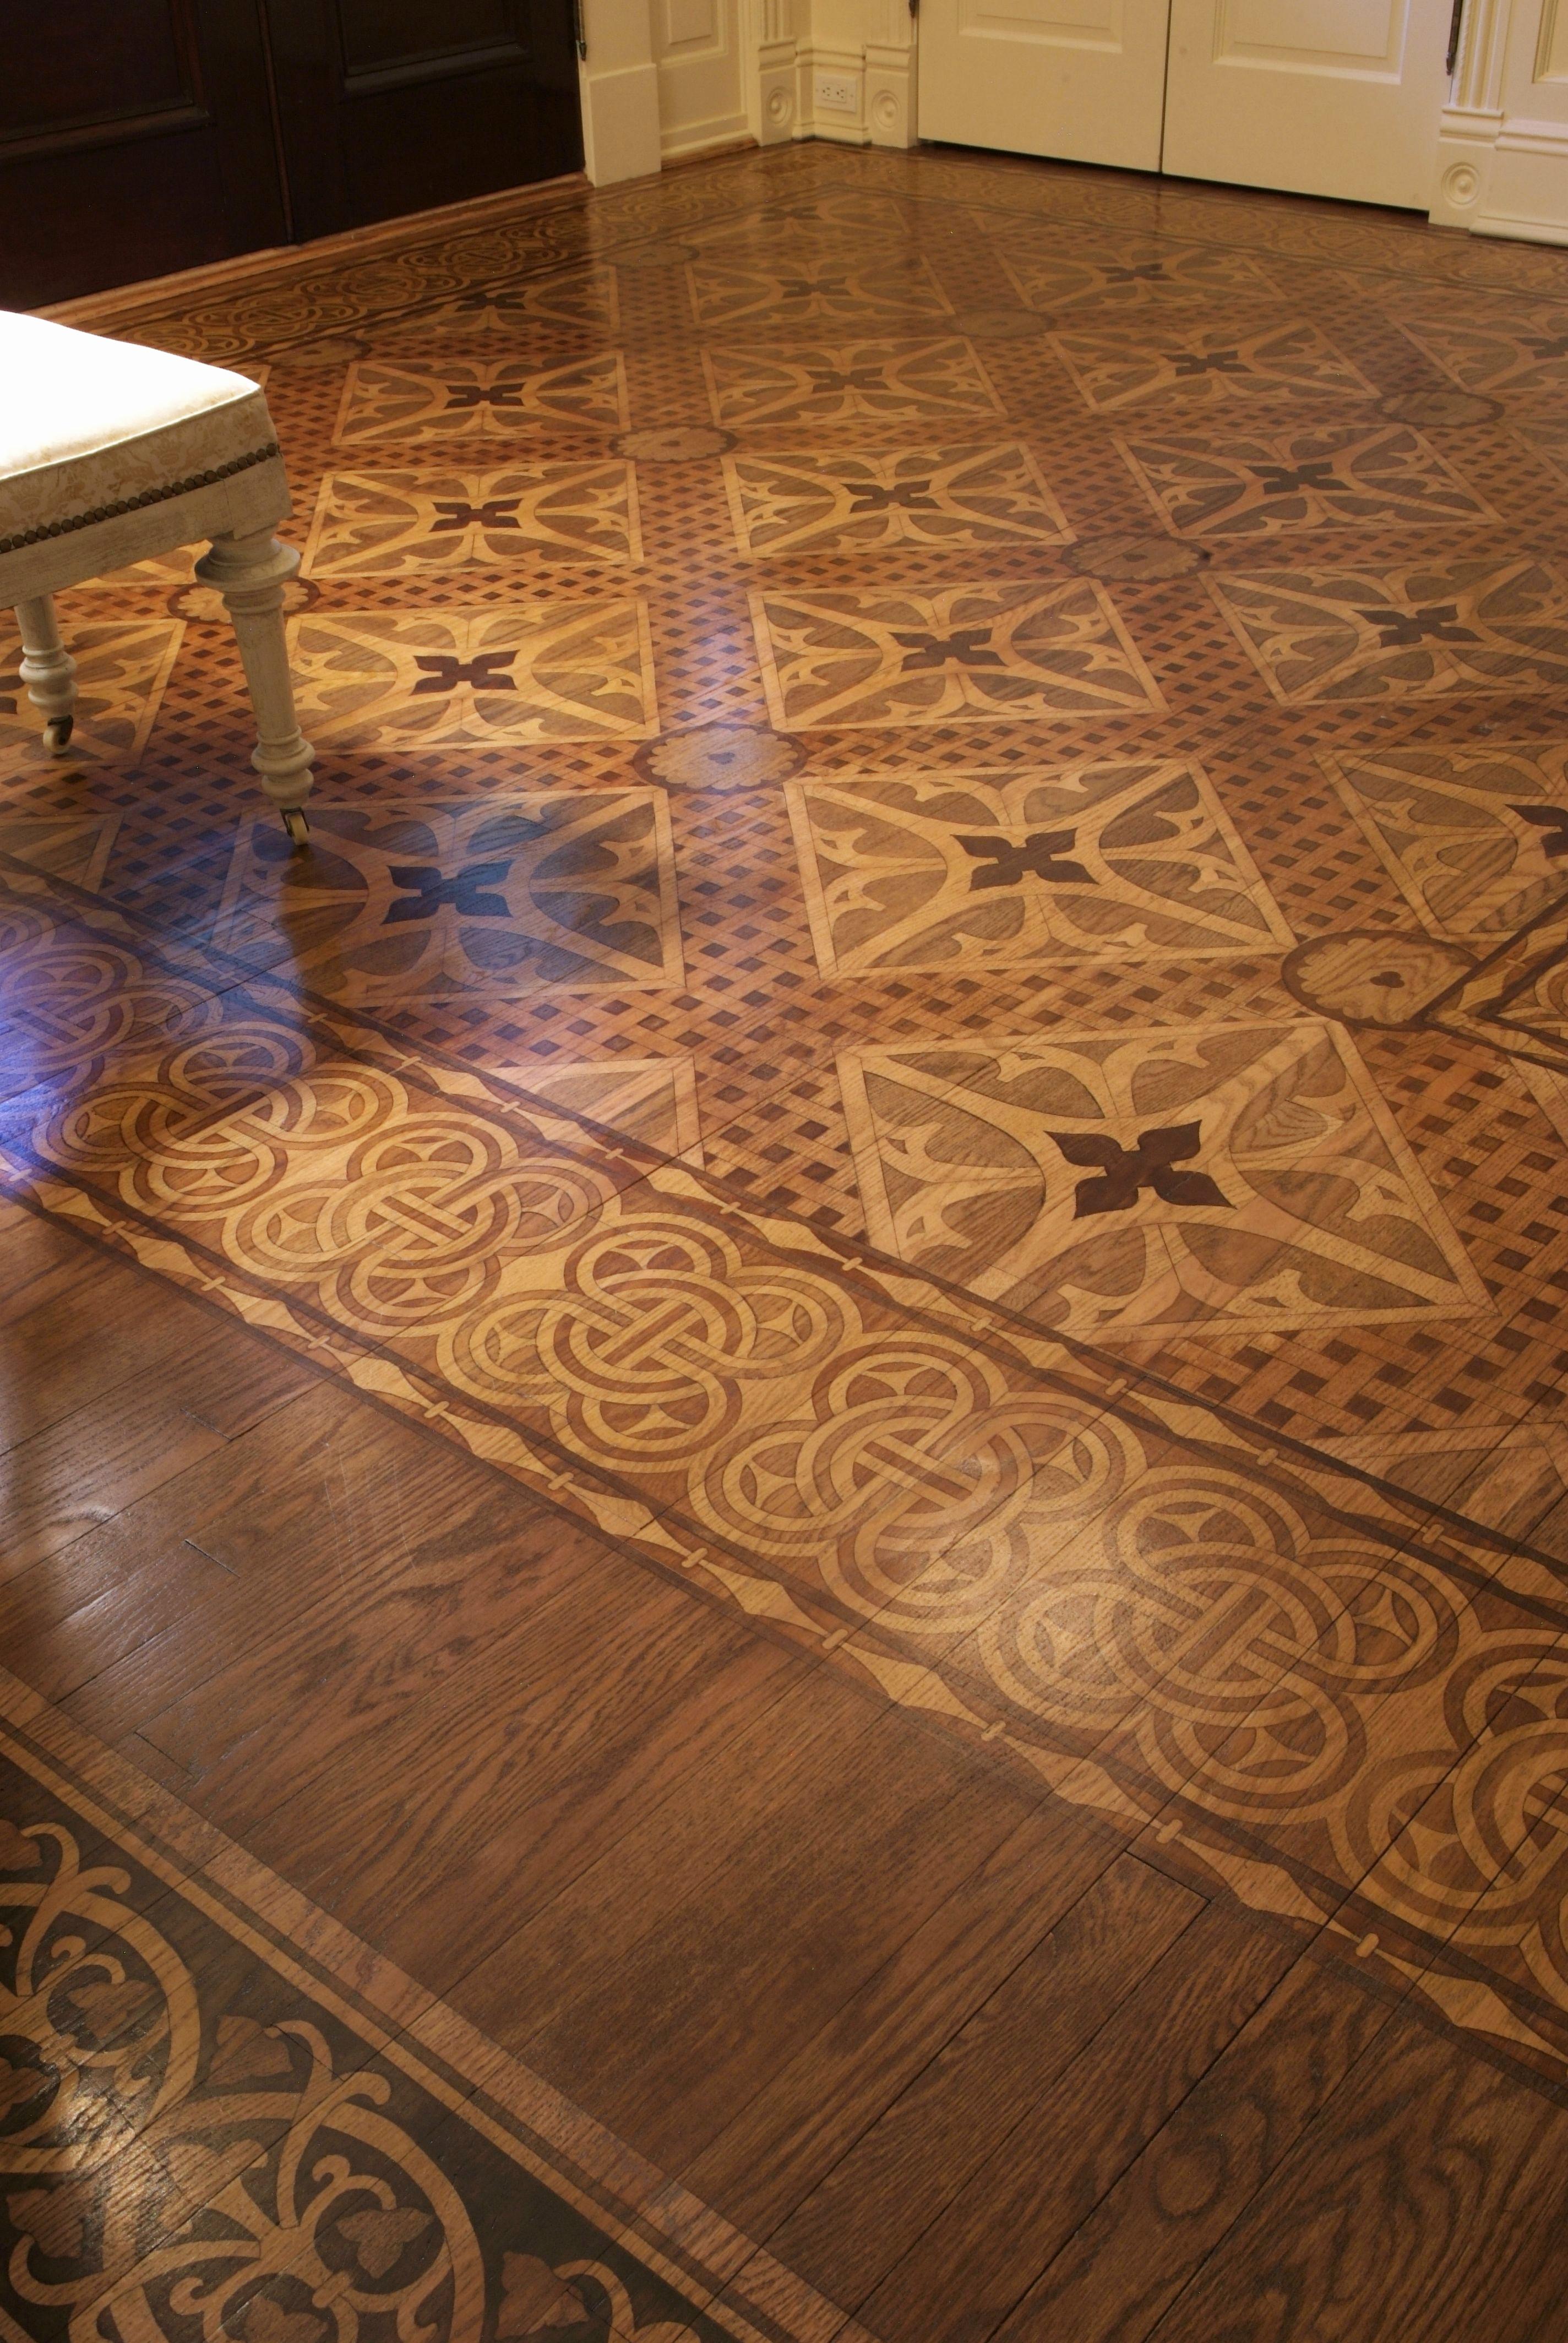 images of painted hardwood floors of brown bag floor 50 luxury painting hardwood floors 50 s floor with brown bag floor 50 luxury painting hardwood floors 50 s